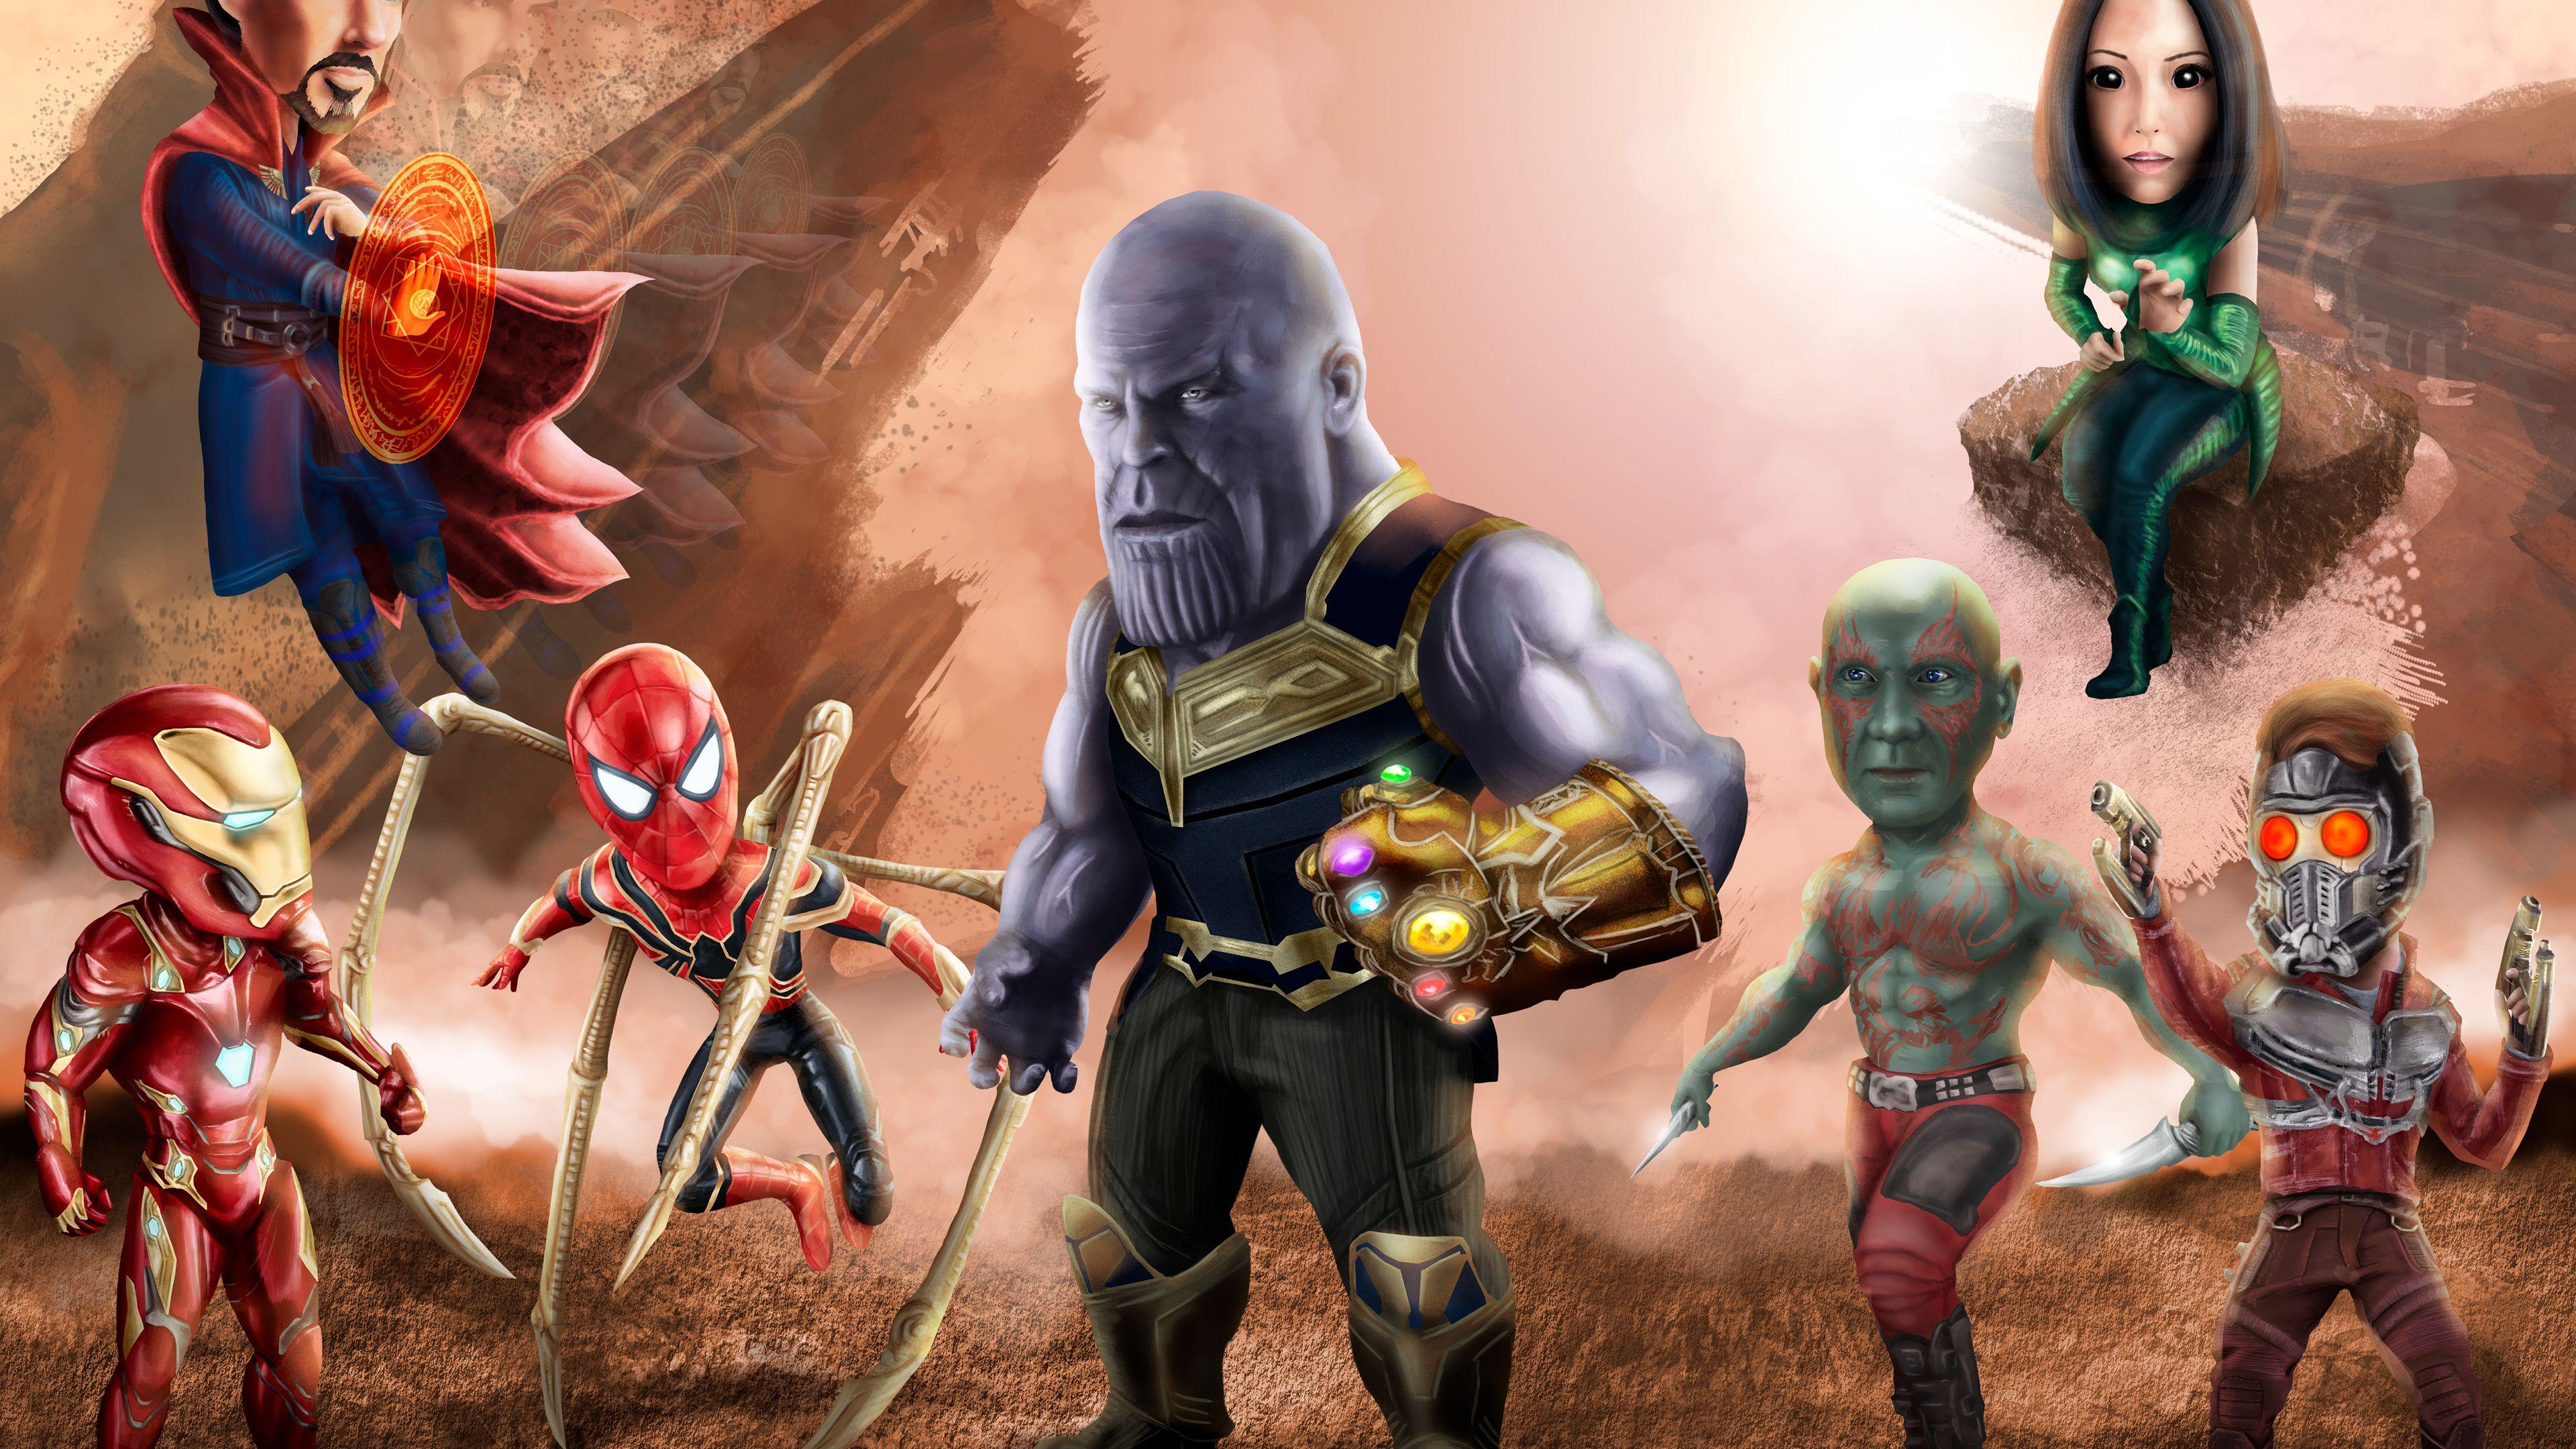 2018 Avengers Infinity War 4k Thanos Wallpapers Superheroes Wallpapers Star Lord Wallpapers Spiderman Wallpapers Mant Iron Man Wallpaper Superhero Avengers